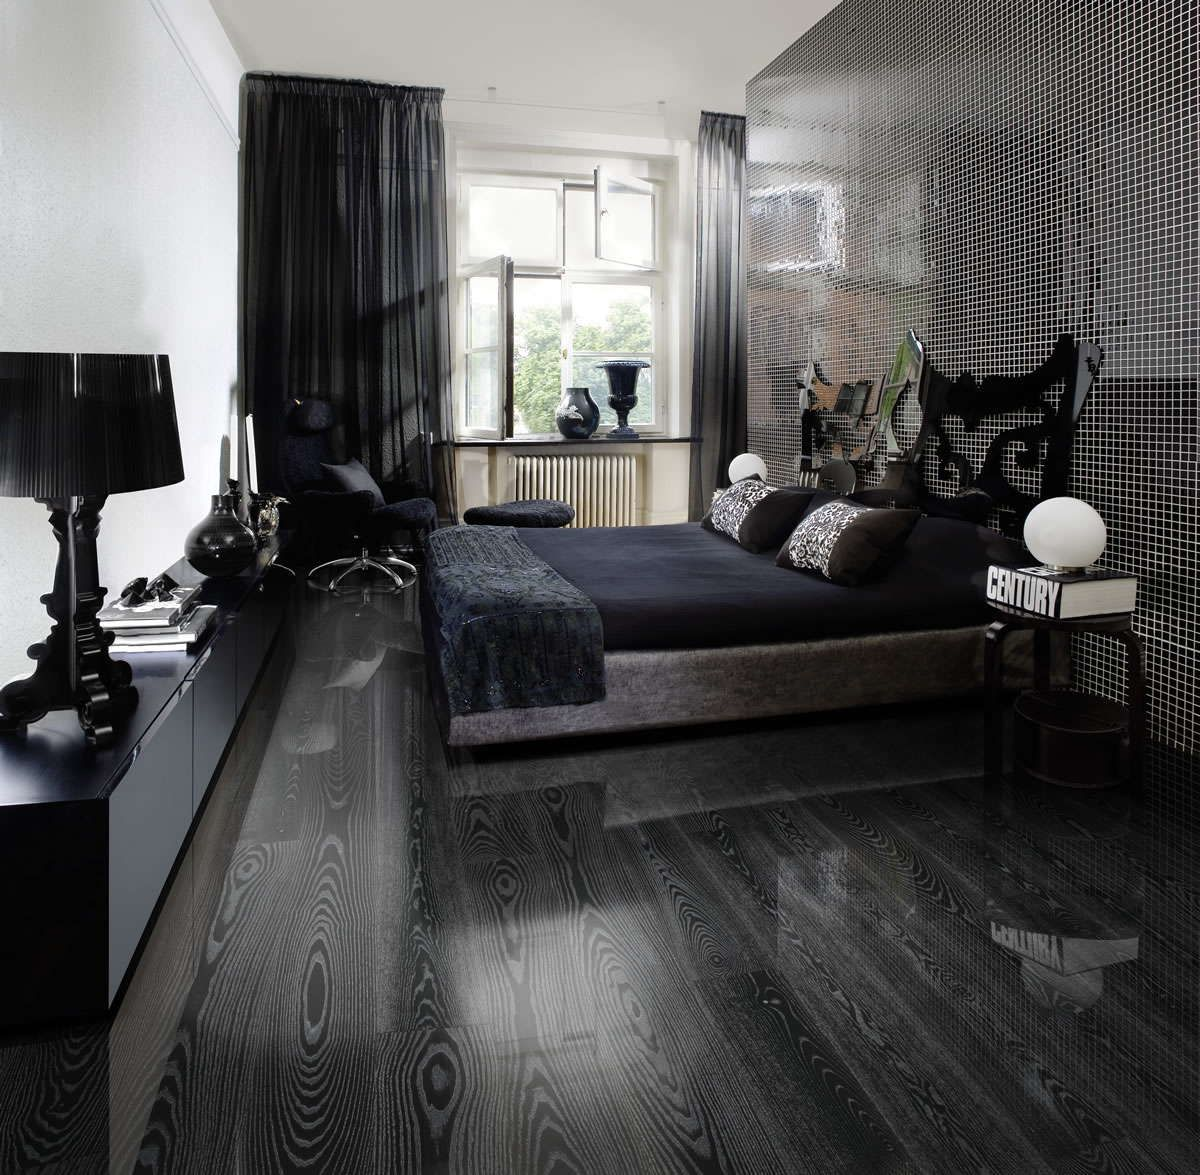 Kahrs Ash Black Silver Engineered Wood Flooring  Black laminate